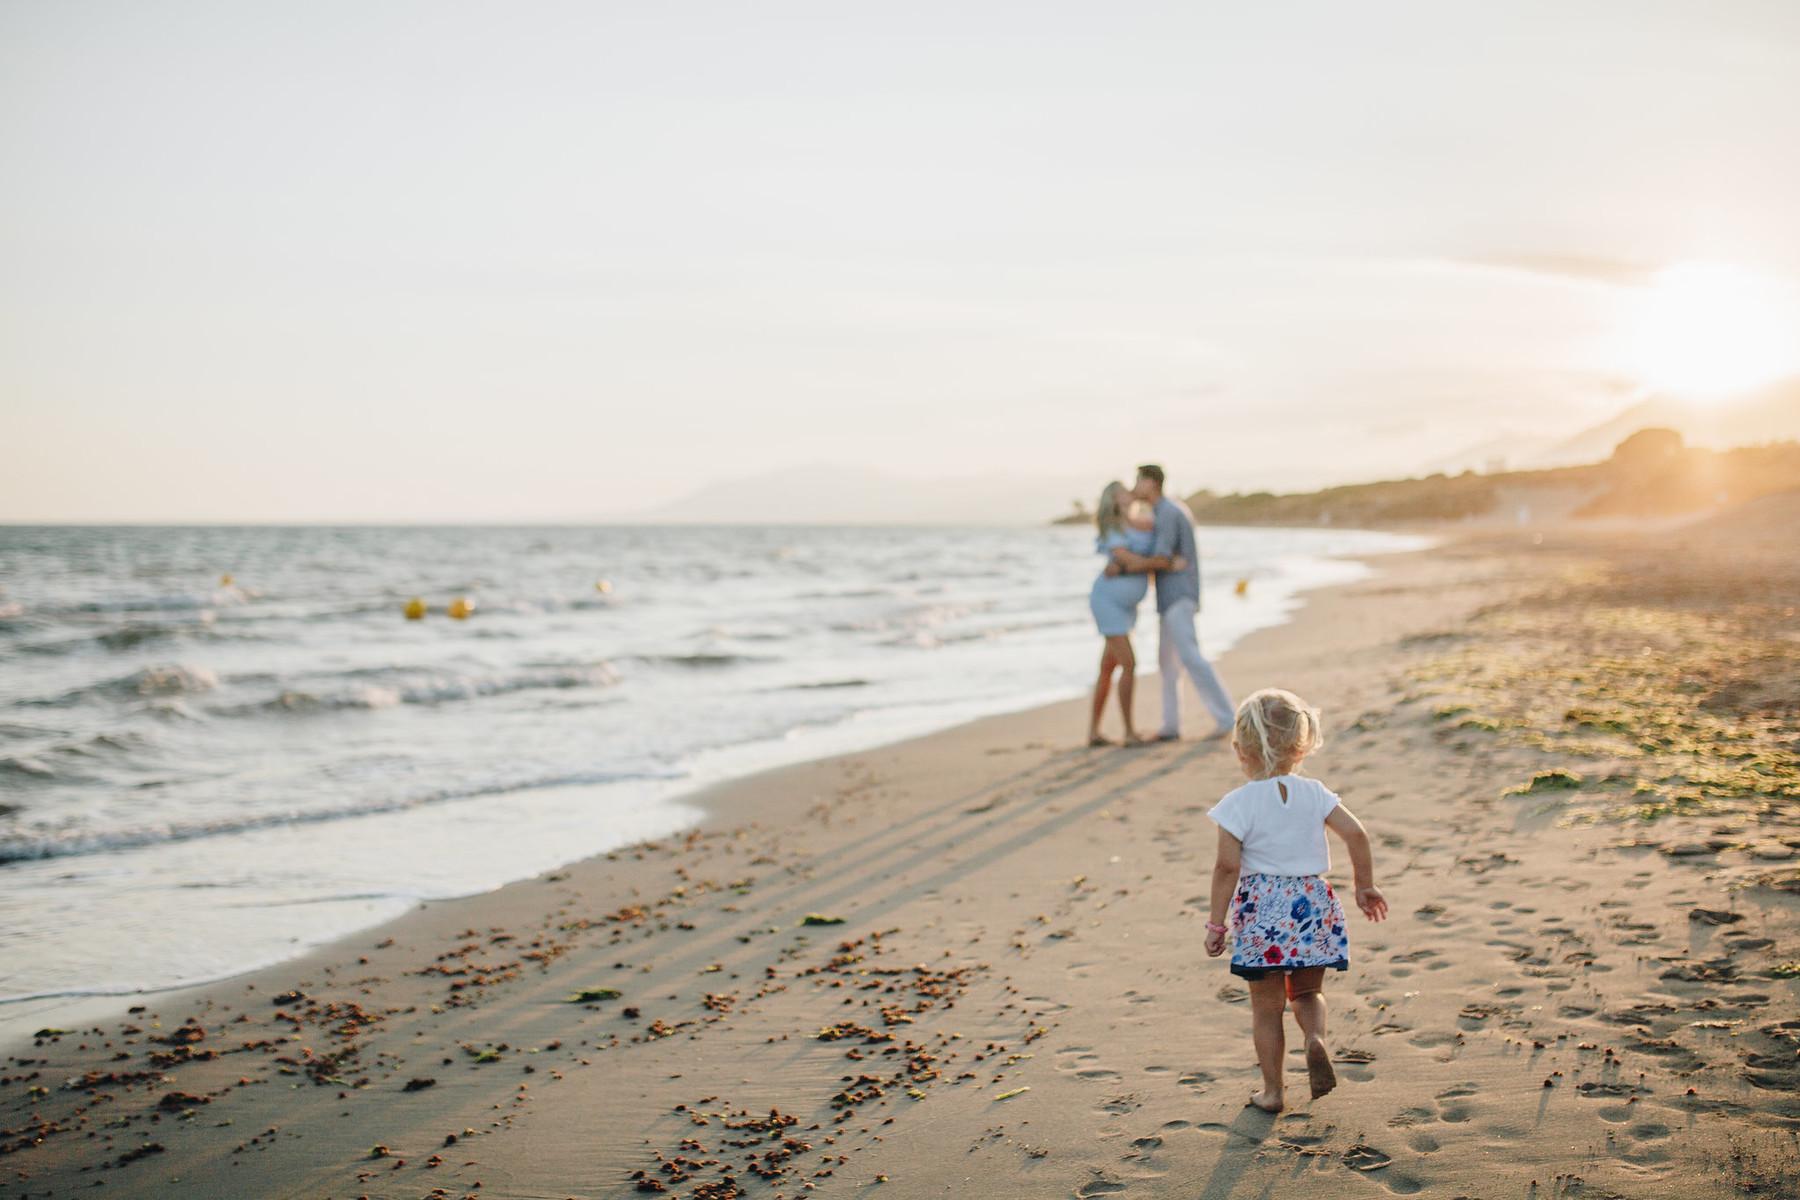 Family photo shoot in Cabopino, Marbella